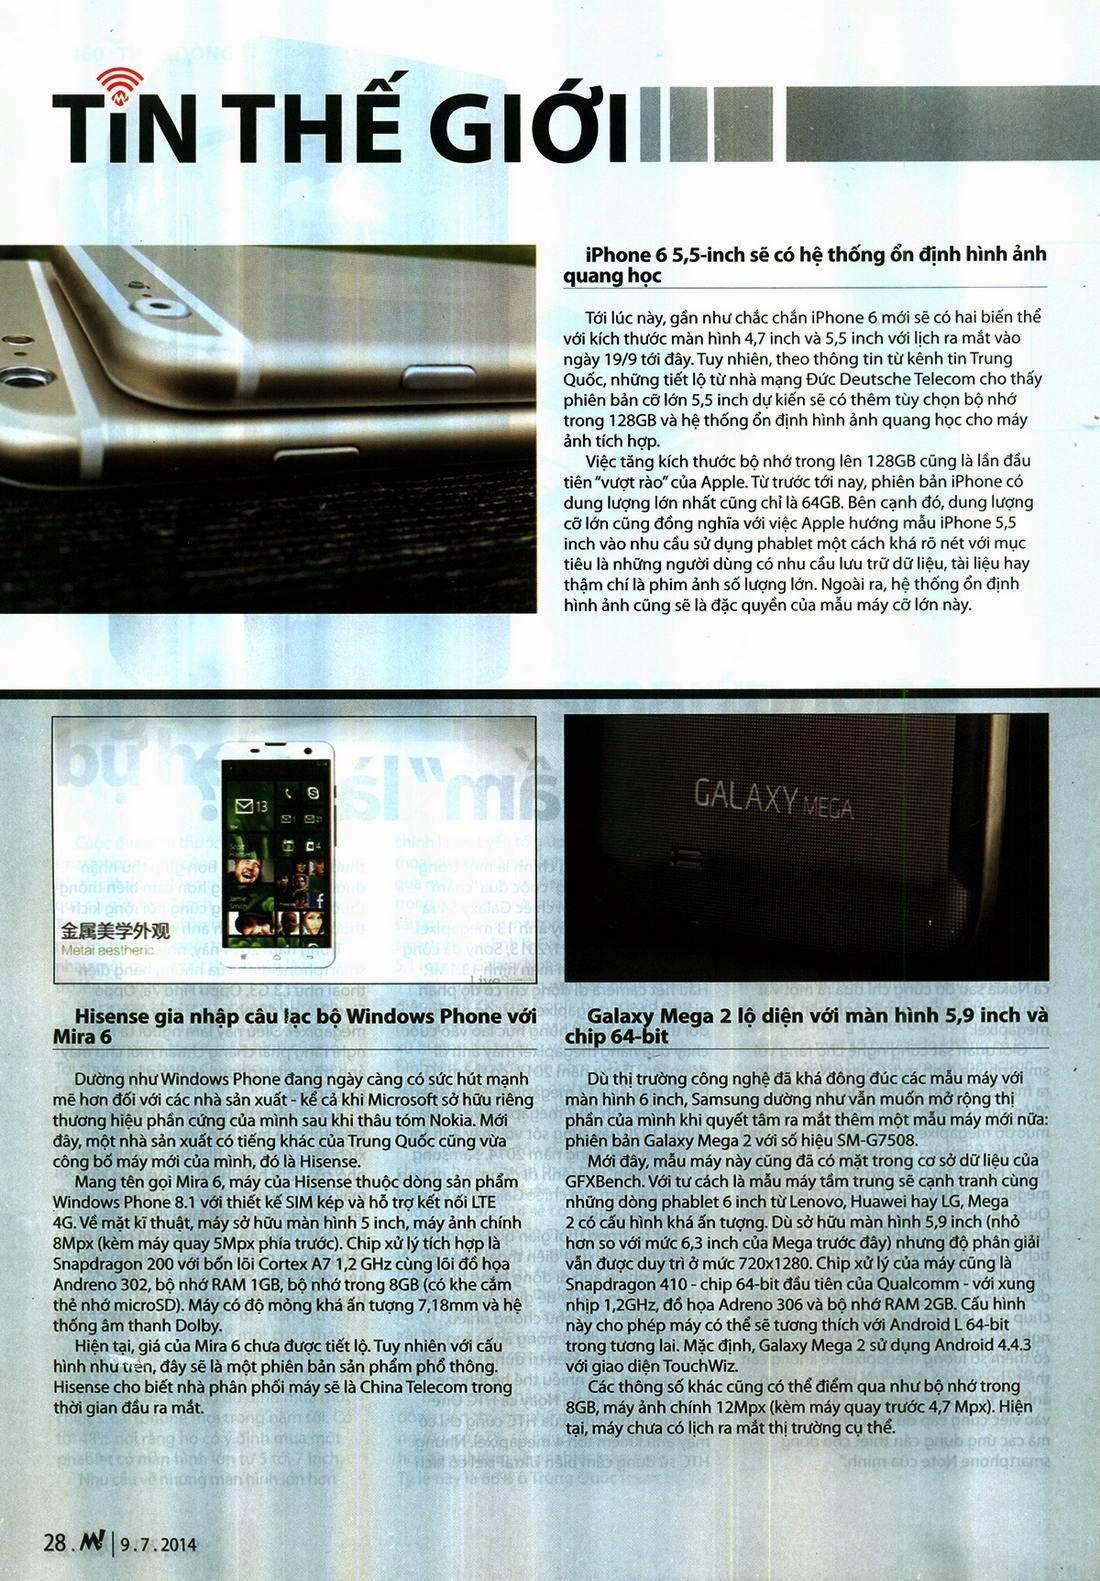 EChip Mobile 460 - tapchicntt.com